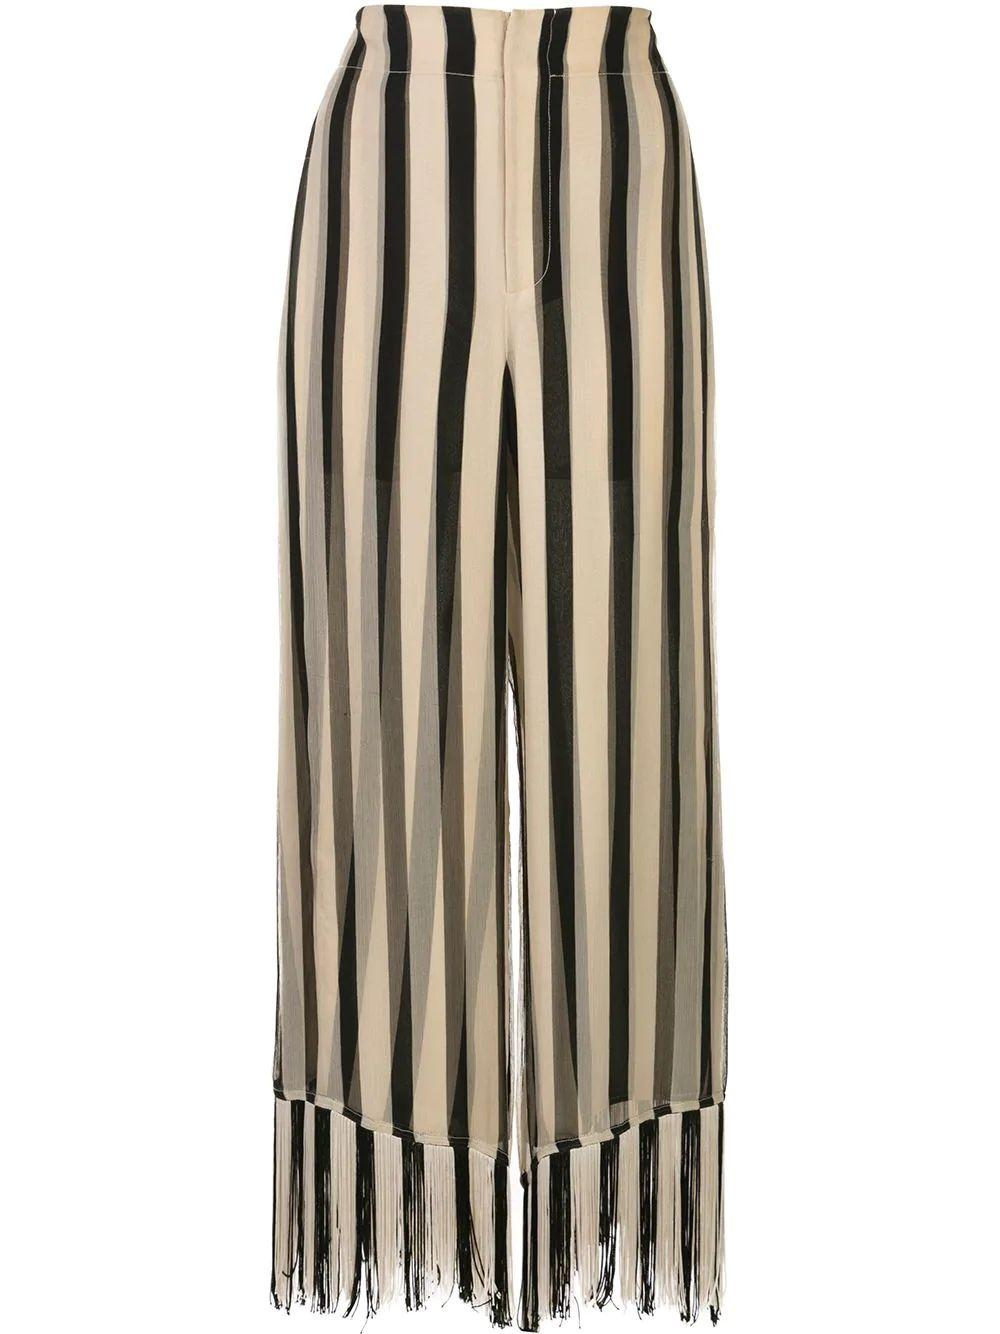 Striped Chiffon Fringe Culotte Item # MR200721CSC